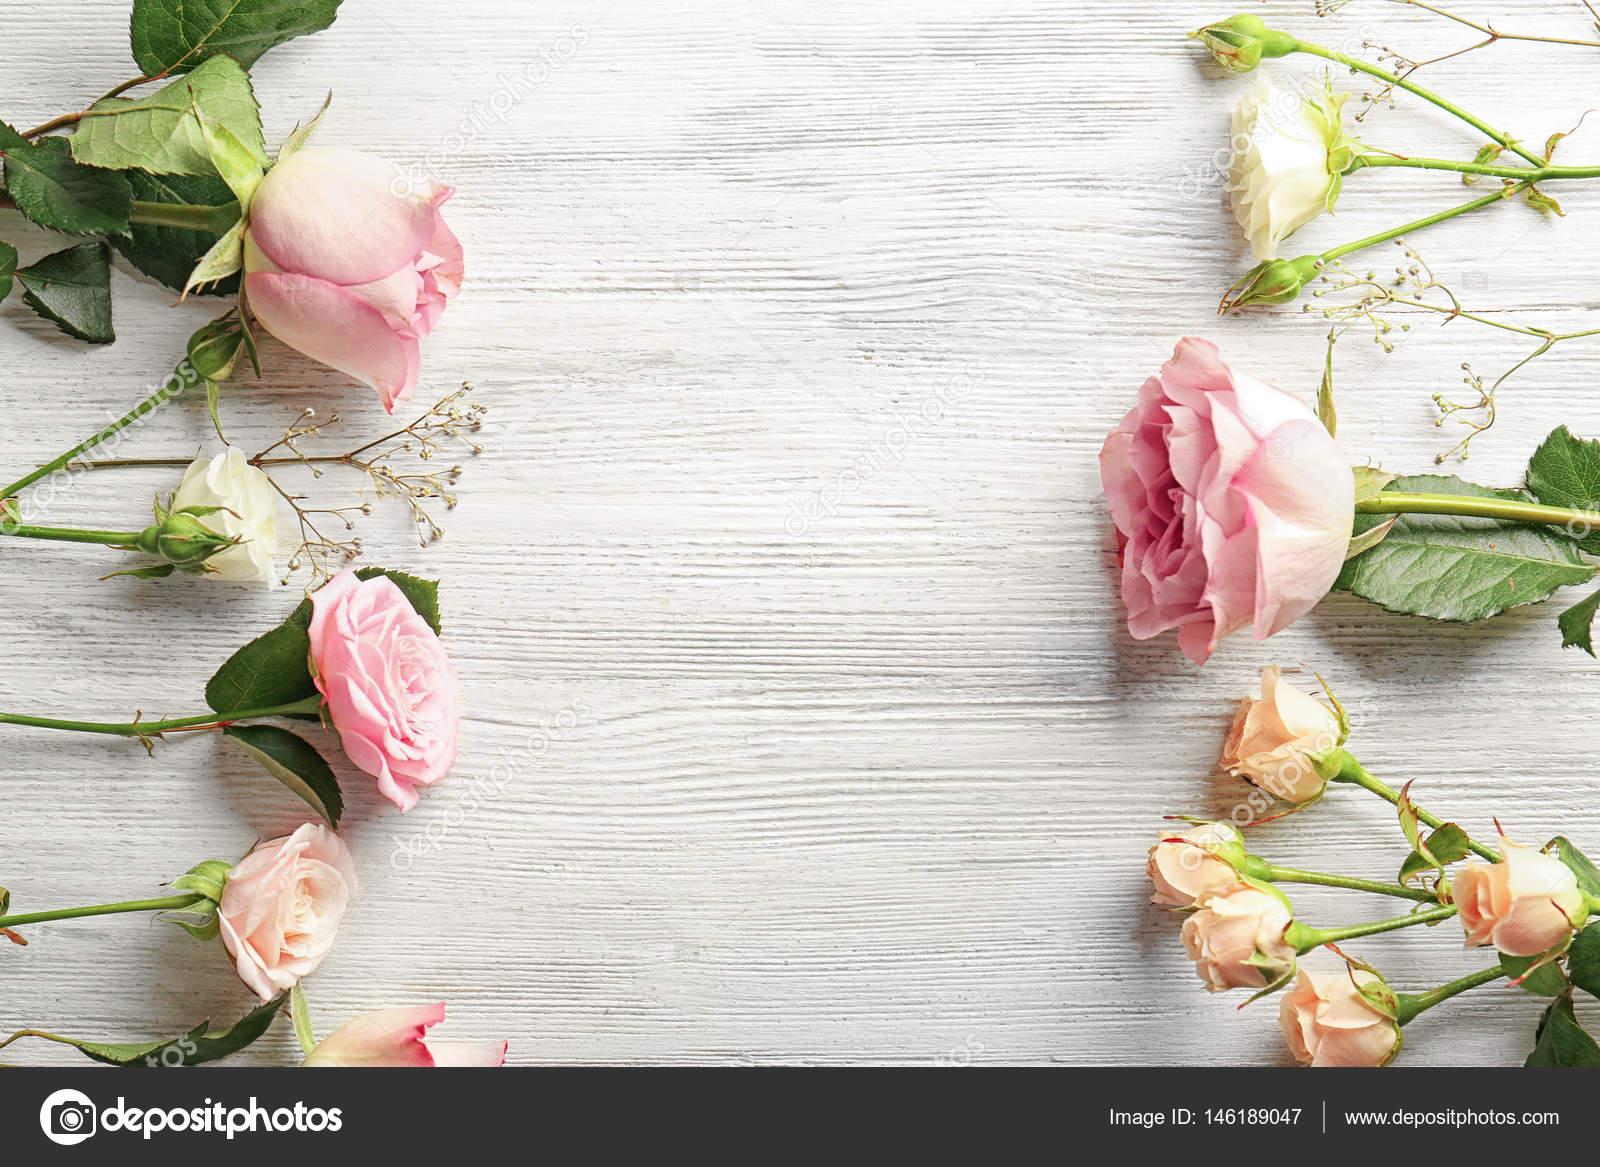 Beautiful fresh flowers stock photo belchonock 146189047 beautiful fresh flowers on white wooden background photo by belchonock izmirmasajfo Gallery